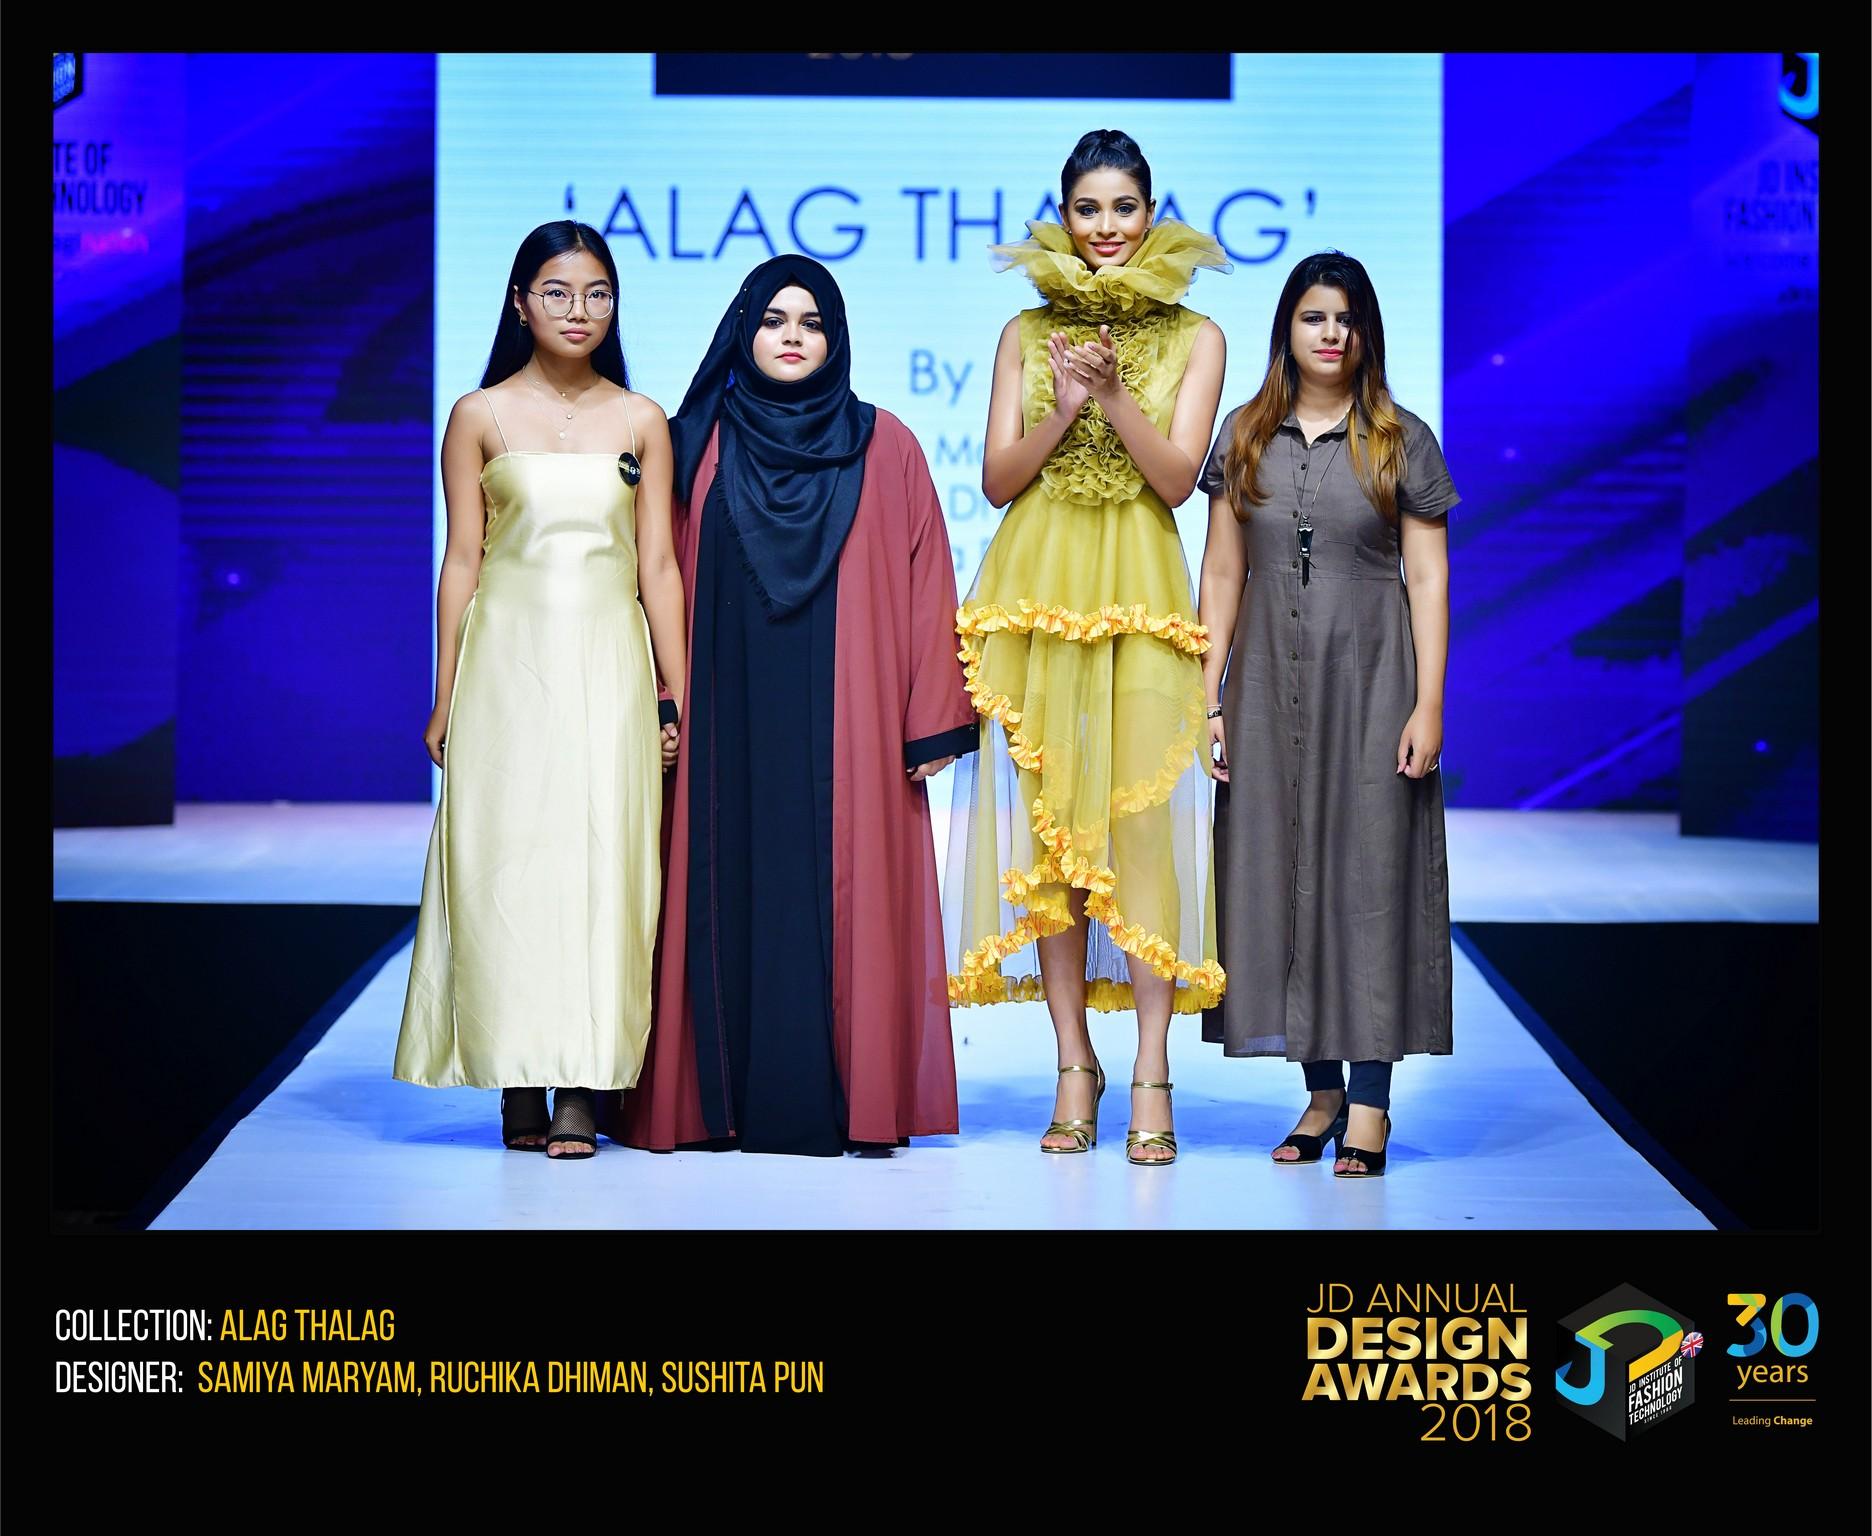 Alag Thalag – Change – JD Annual Design Awards 2018 | Designer: Sushita, Samiya and Ruchika | Photography : Jerin Nath (@jerin_nath) alag thalag Alag Thalag – Change – JD Annual Design Awards 2018 ALAG THALAG 8